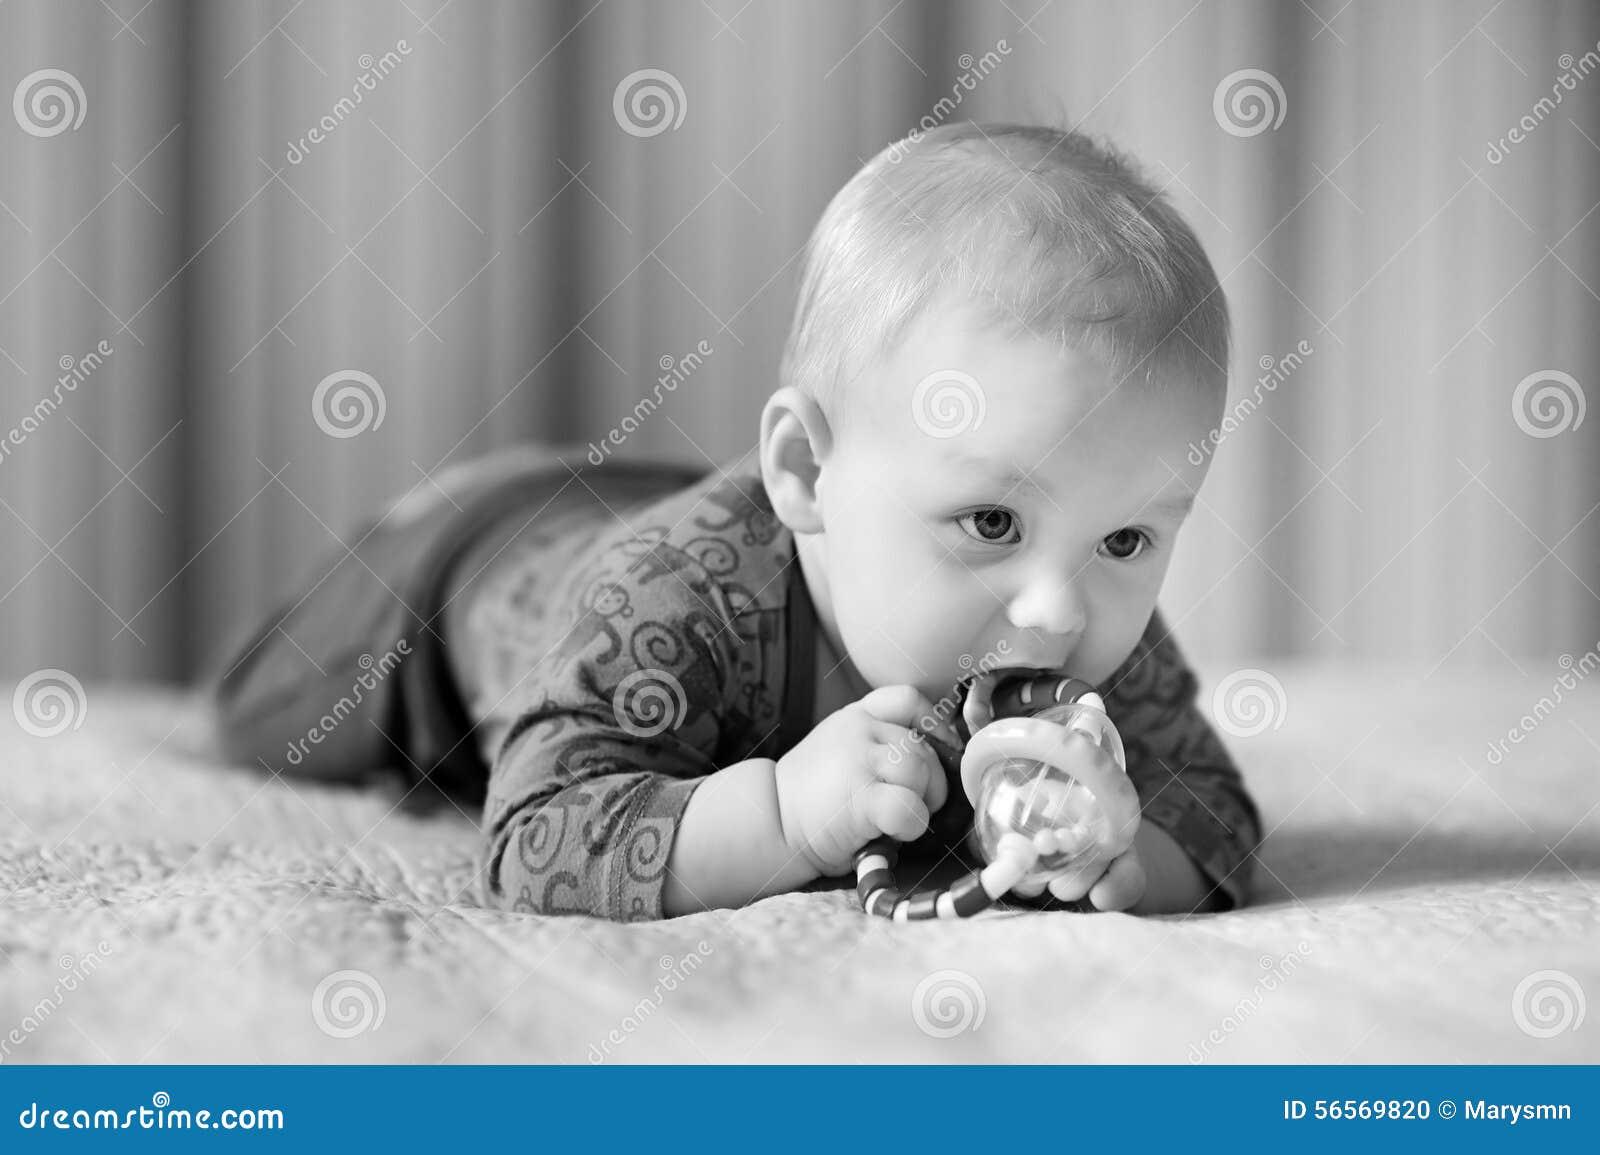 Download Εξάμηνο παλαιό παιχνίδι μωρών με τα παιχνίδια Στοκ Εικόνες - εικόνα από ανακάλυψη, συγκέντρωση: 56569820